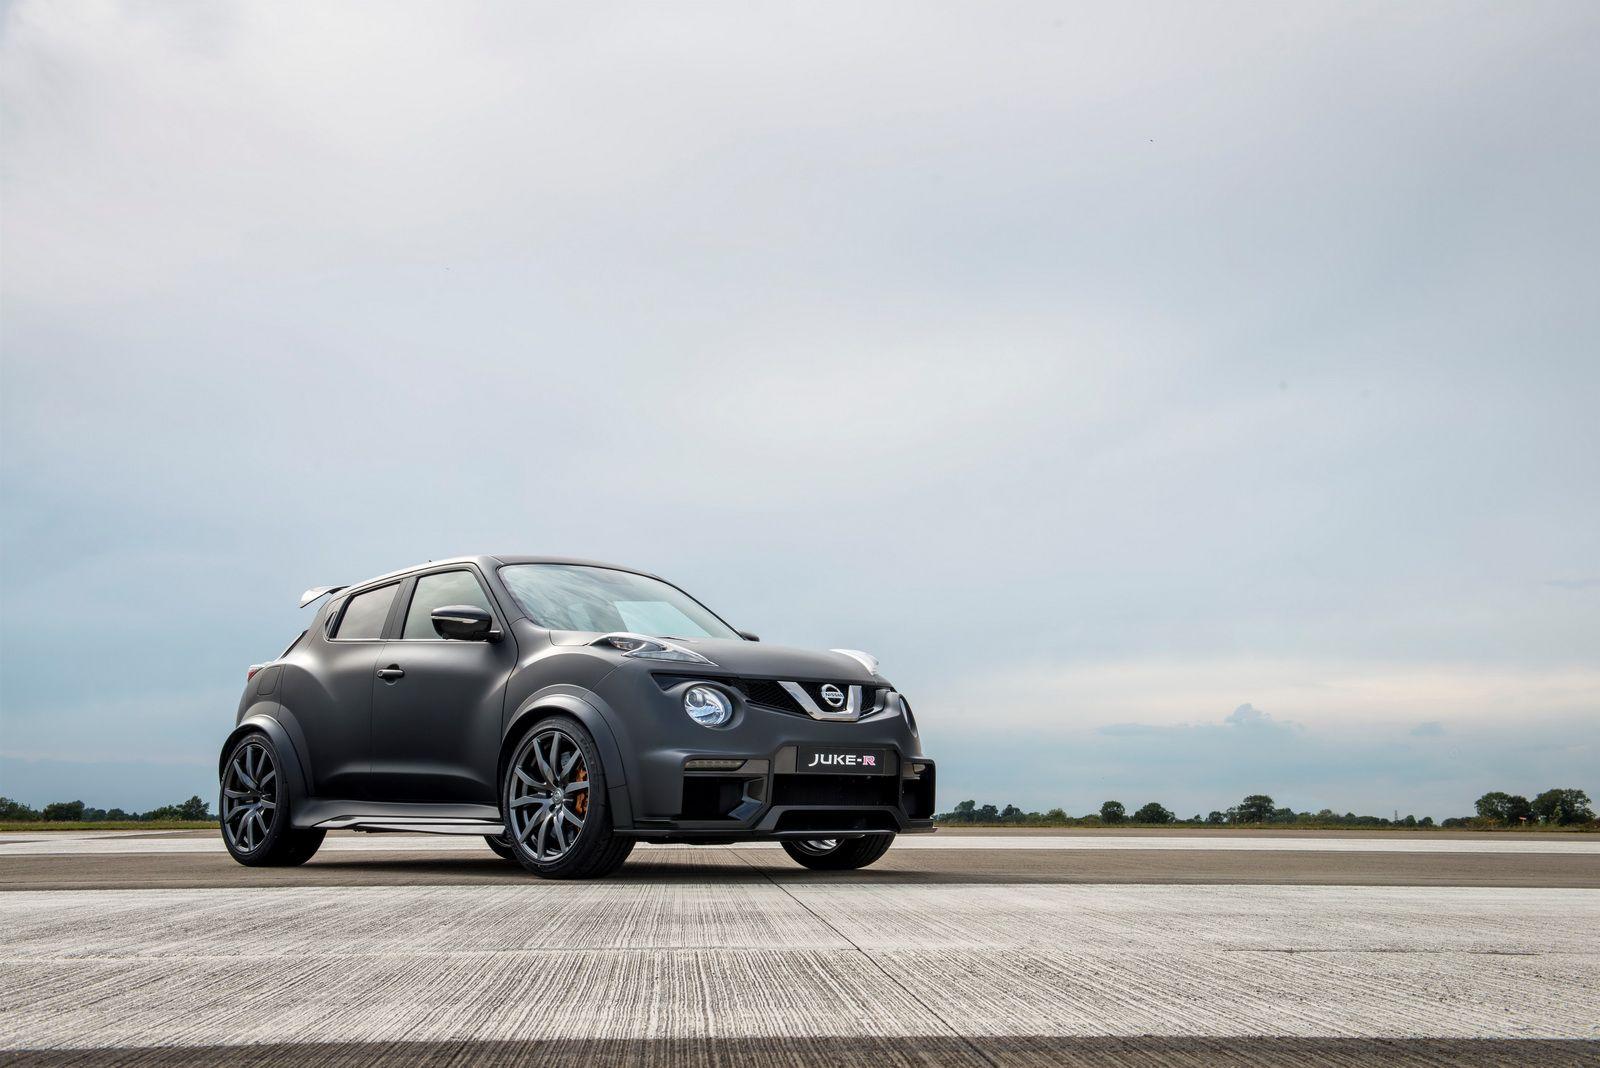 Nissan løfter sløret for vanvittig Juke-R